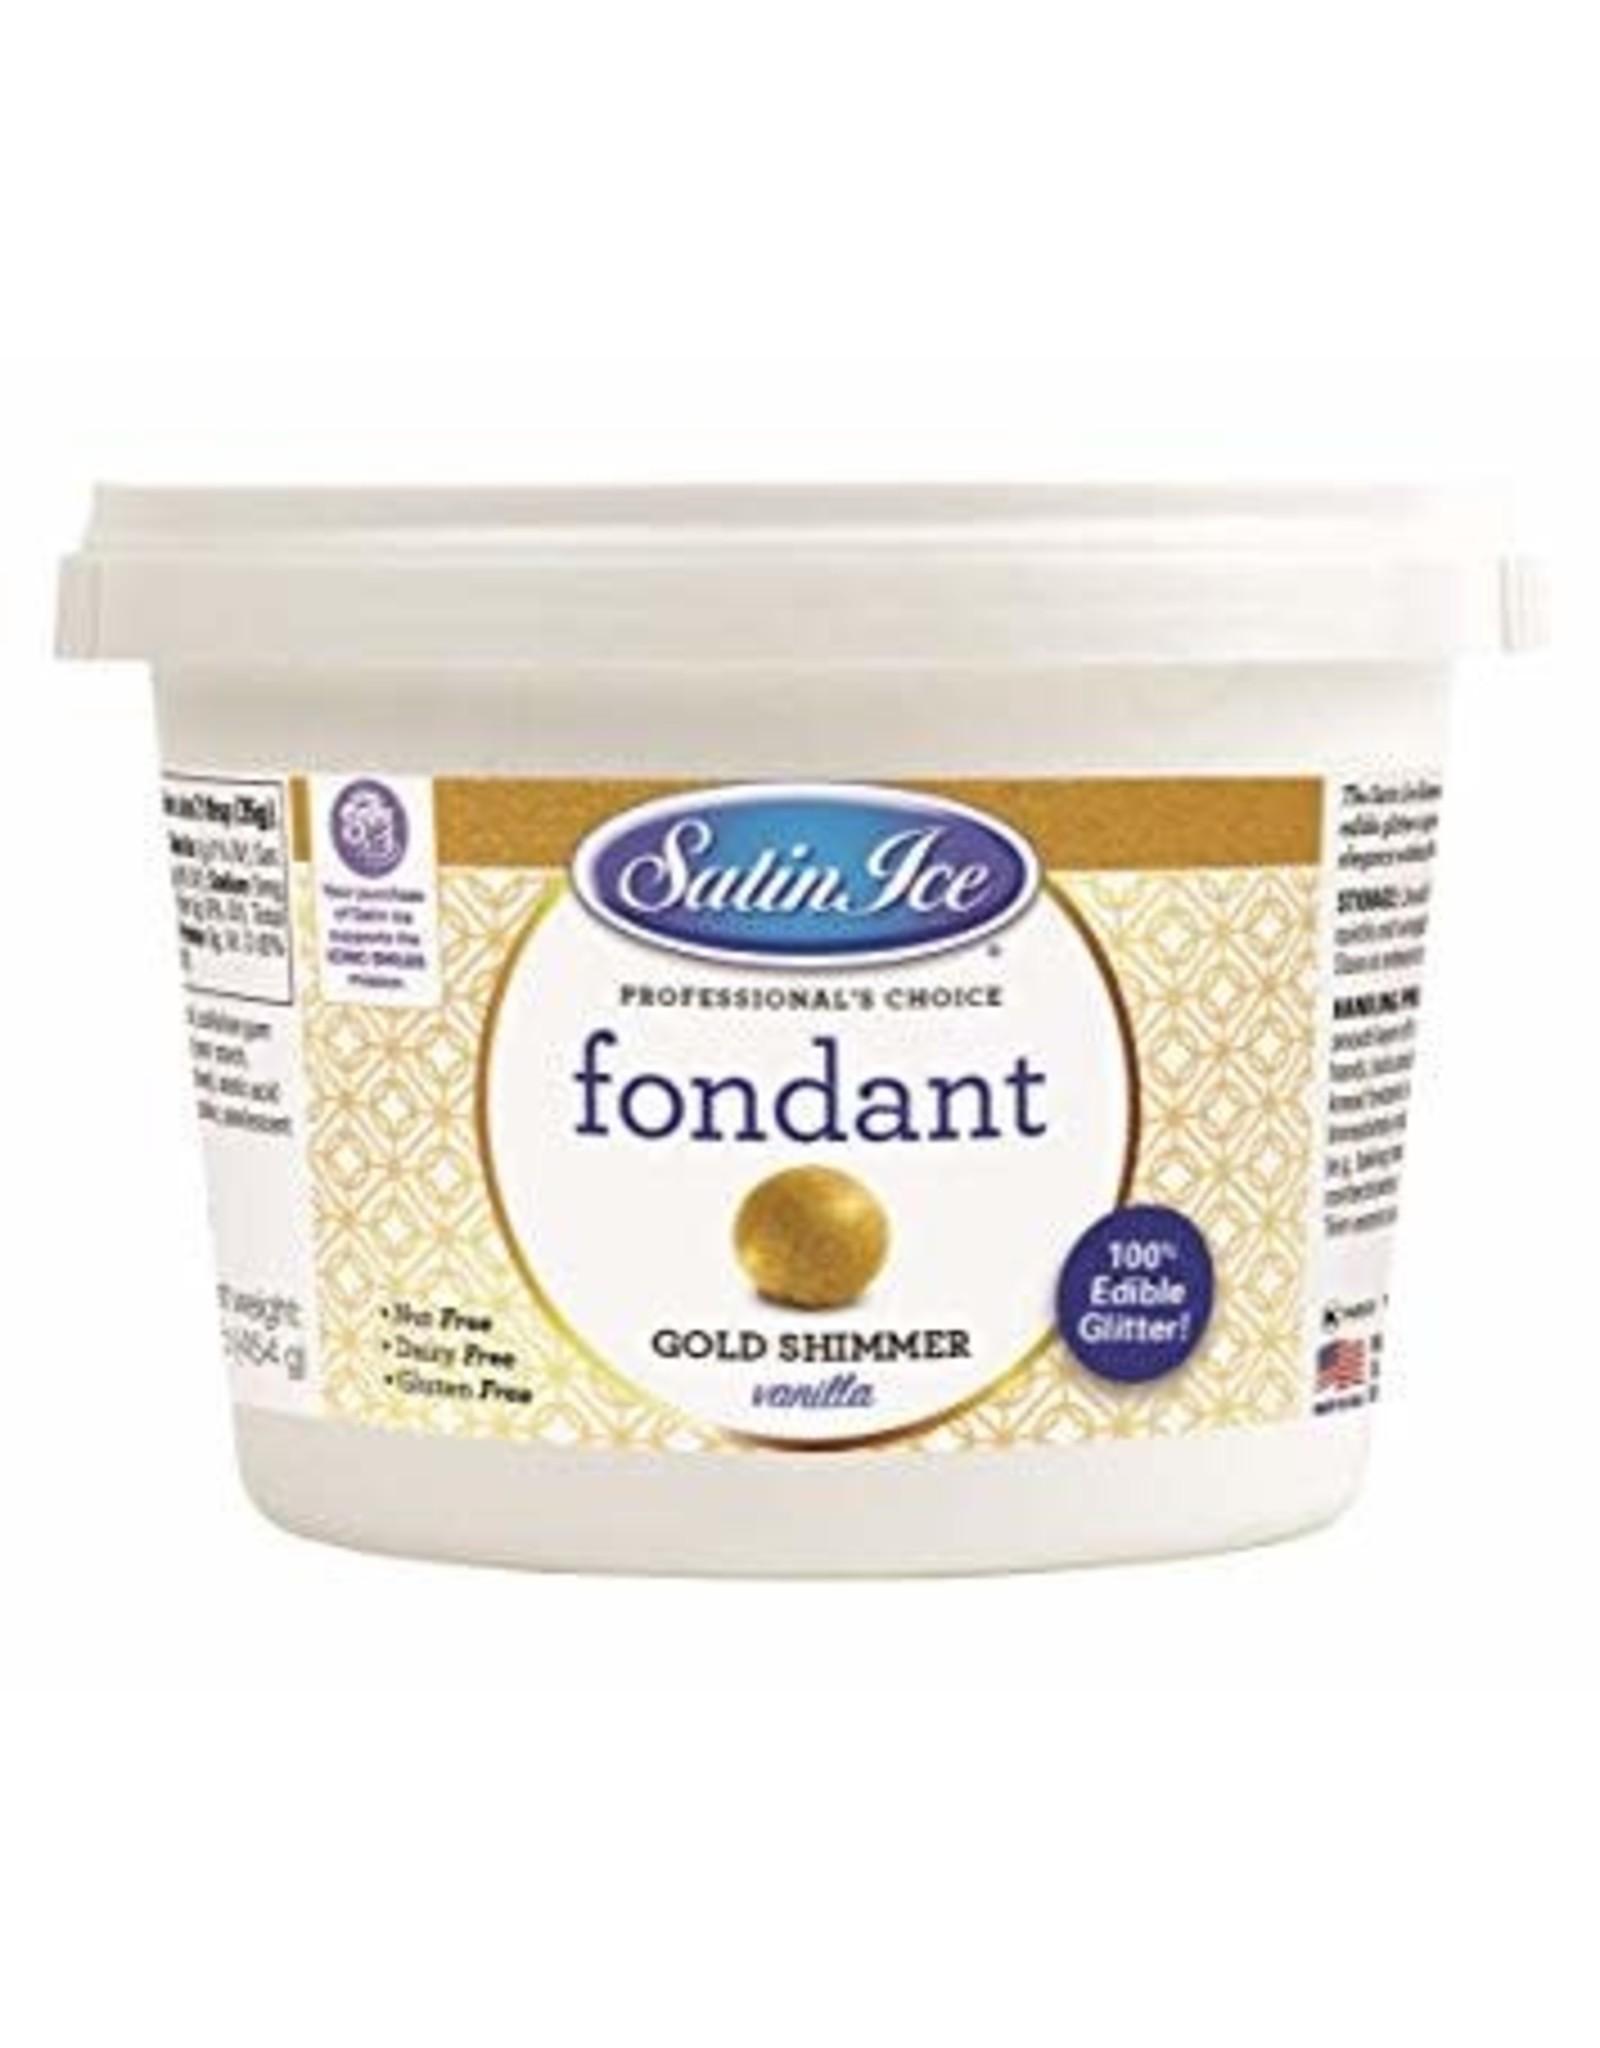 Satin Ice 1 Lb Gold Shimmer Fondant